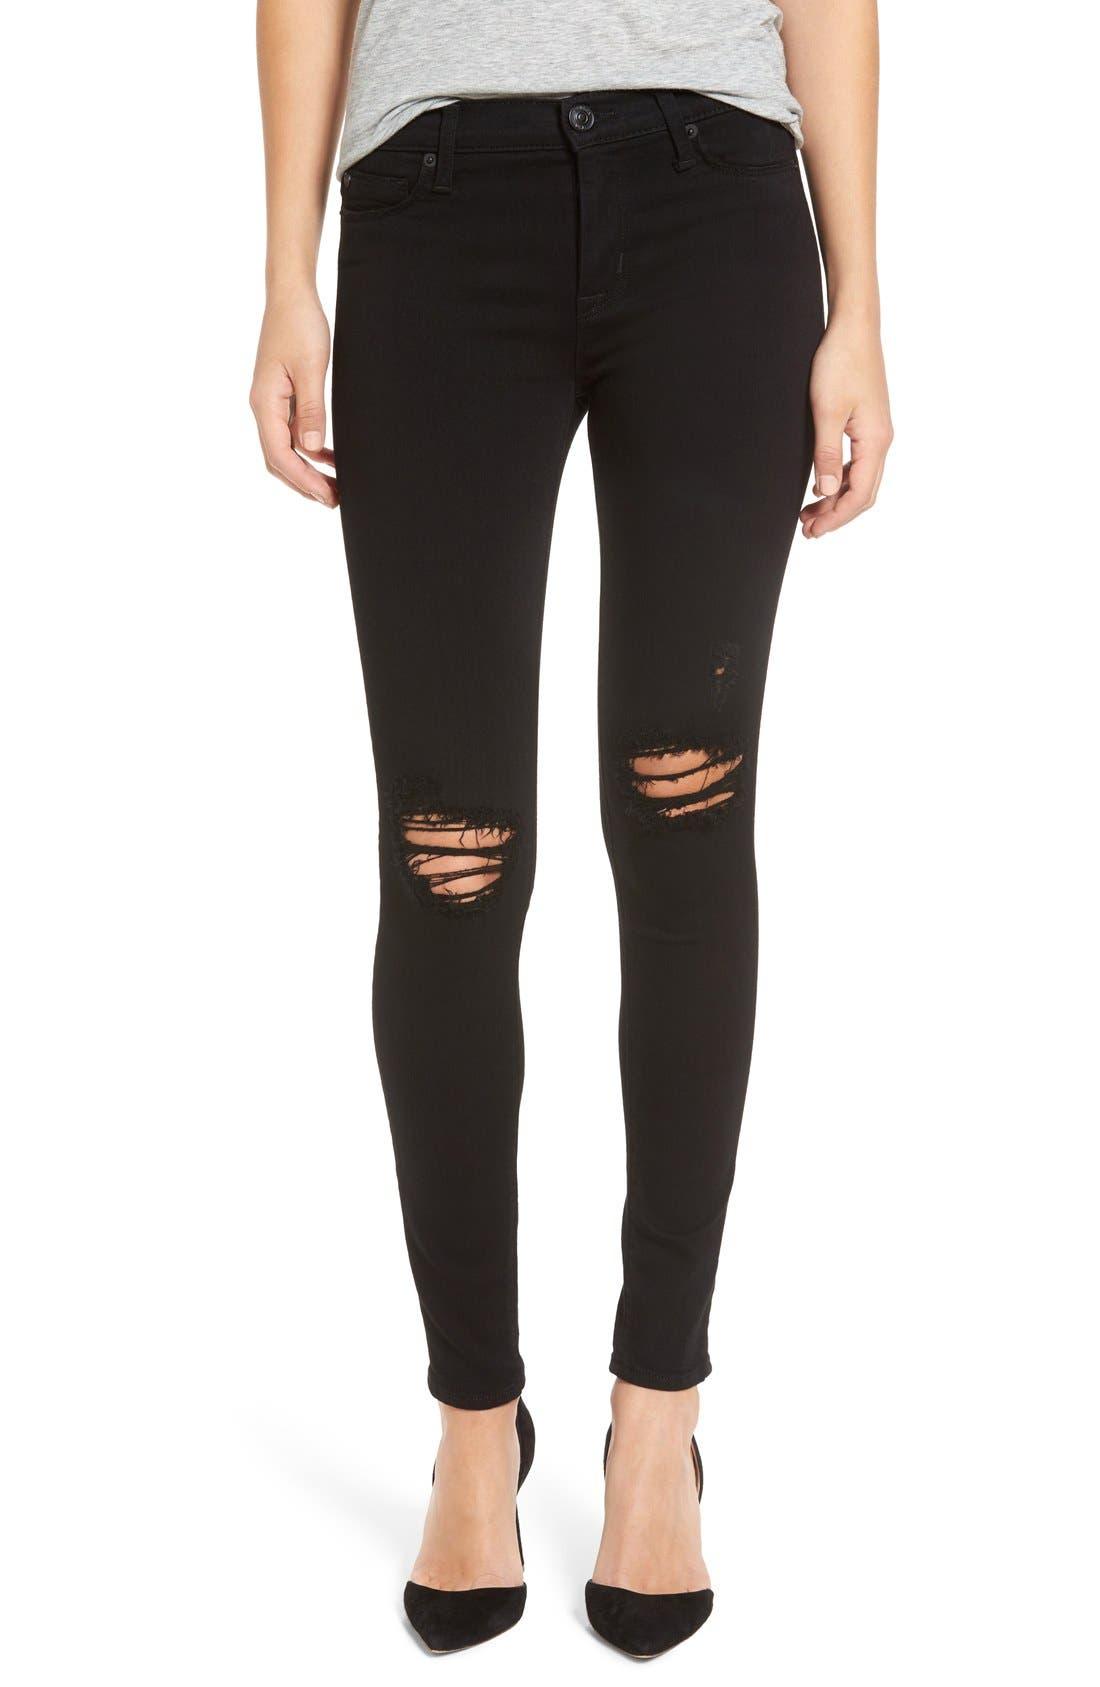 Alternate Image 1 Selected - Hudson Jeans 'Nico' Skinny Jeans (Ravage)